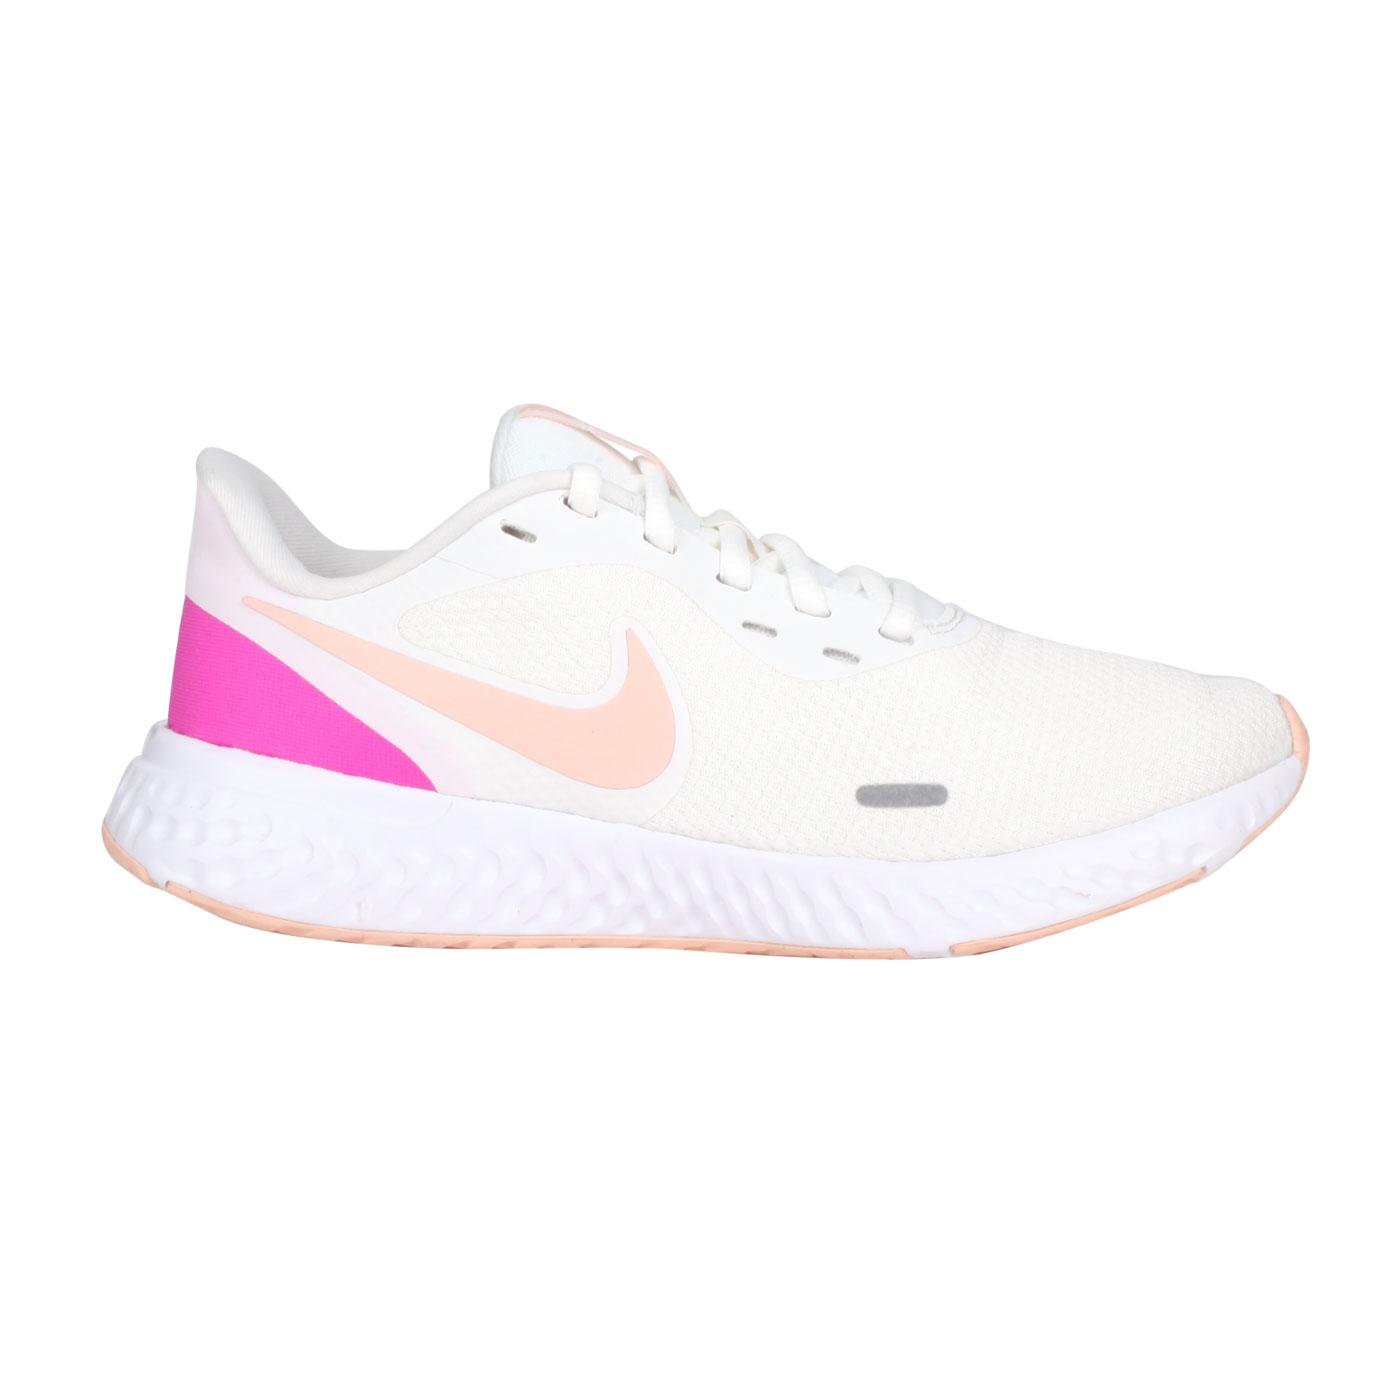 NIKE 女款慢跑鞋  @WMNS REVOLUTION 5@BQ3207002 - 米白紫粉橘